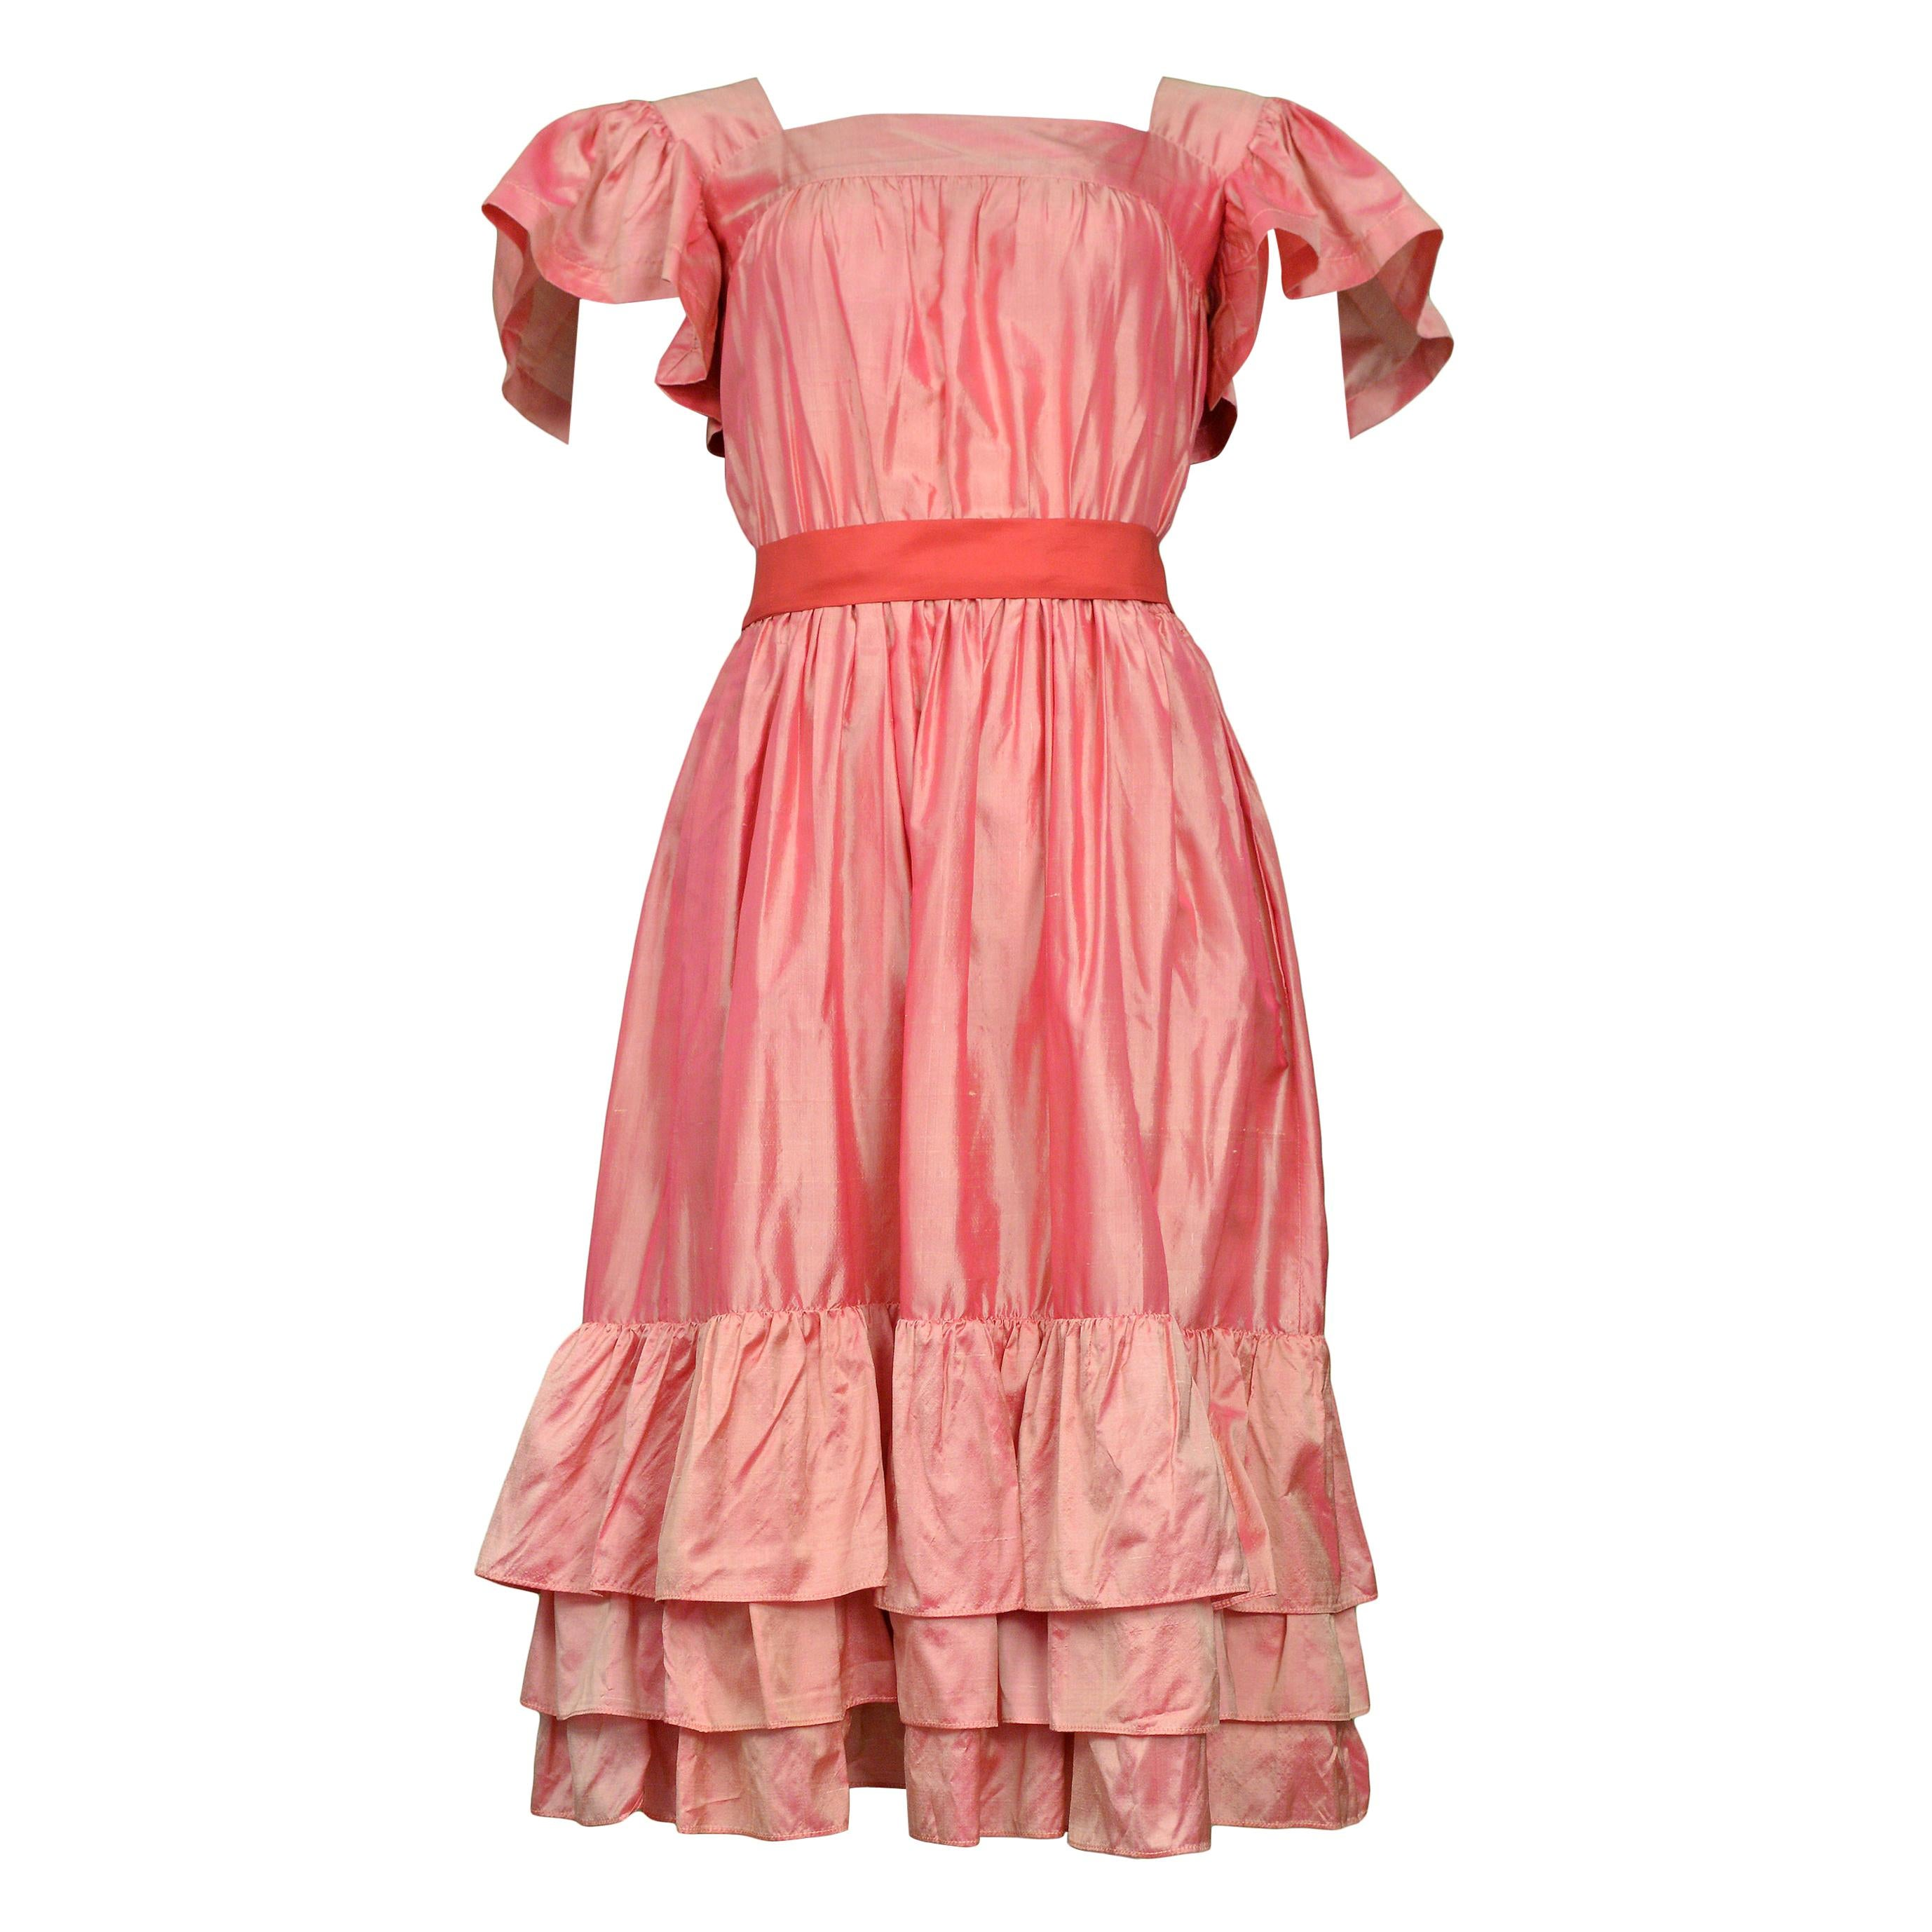 Vintage Yves Saint Laurent Pink Taffeta Party Dress